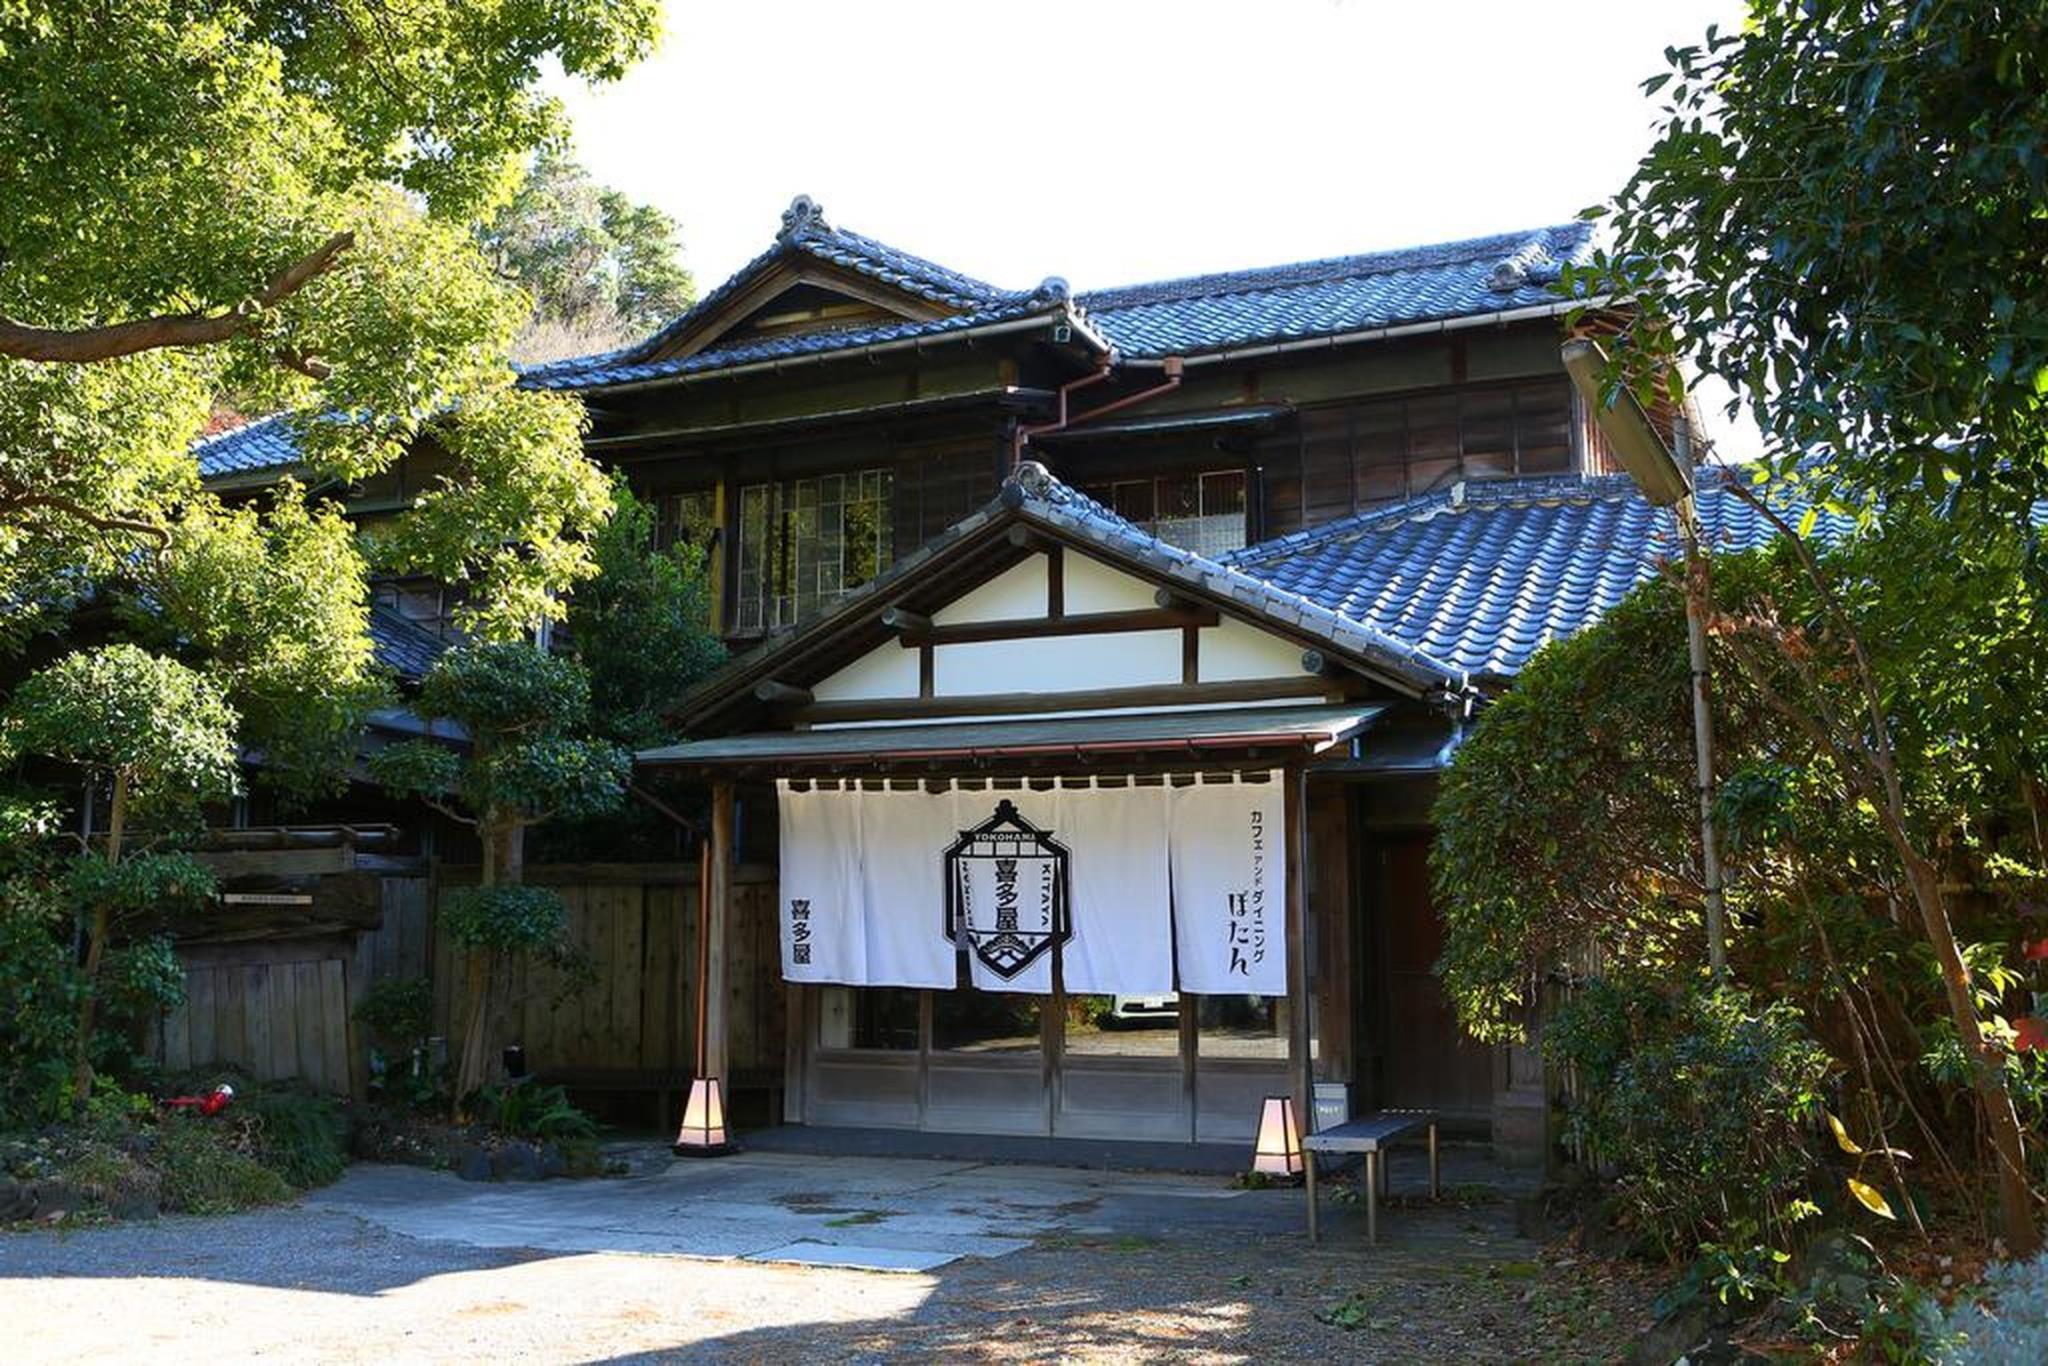 Kitaya Ryokan - Cultural Heritage Inn, Yokohama